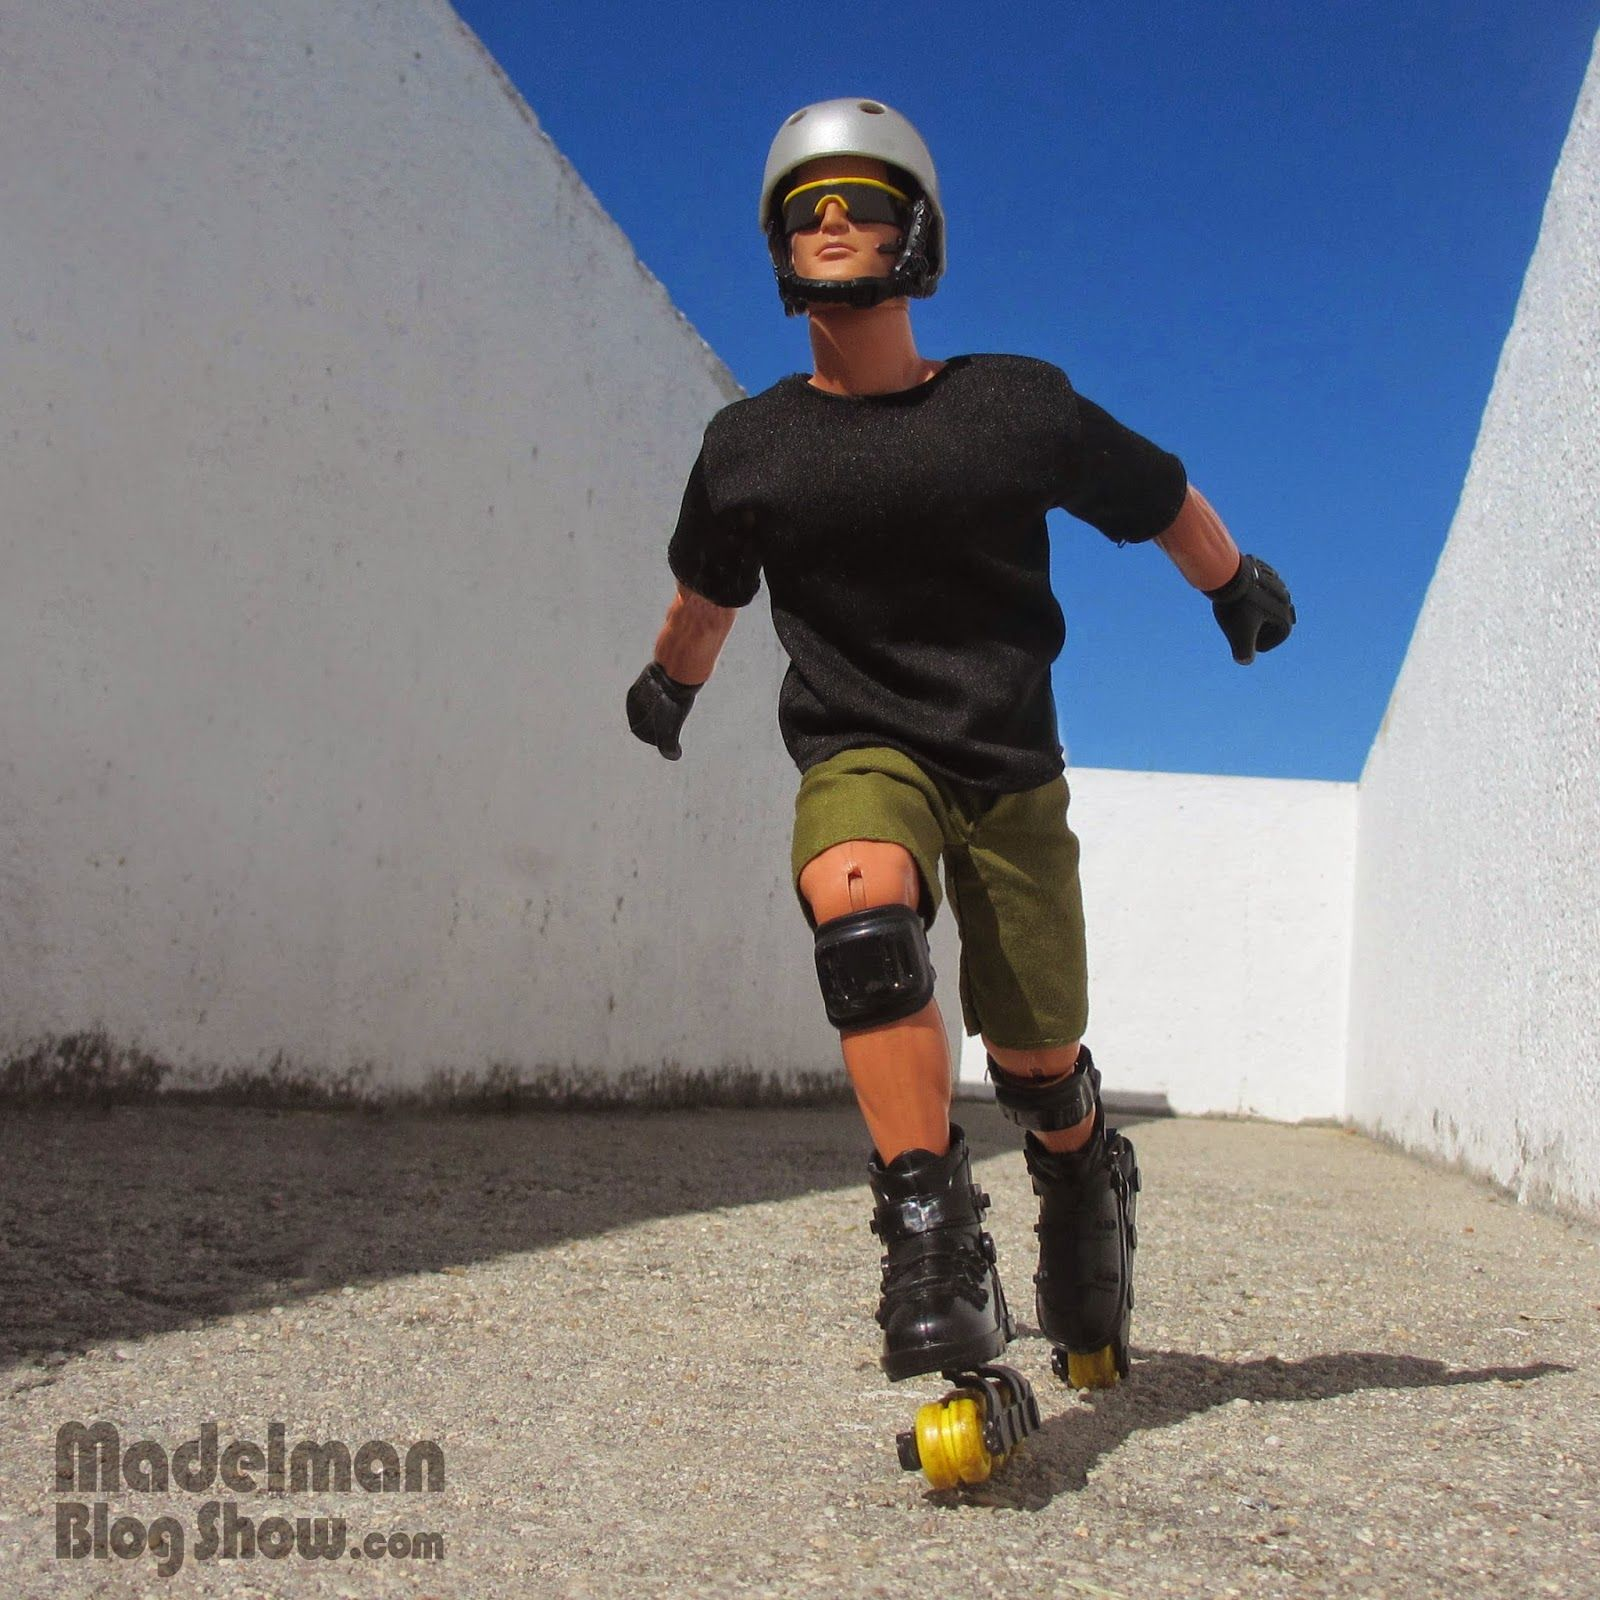 Roller skate xtreme - Madelman Blog Show Action Man Roller Extreme Hasbro